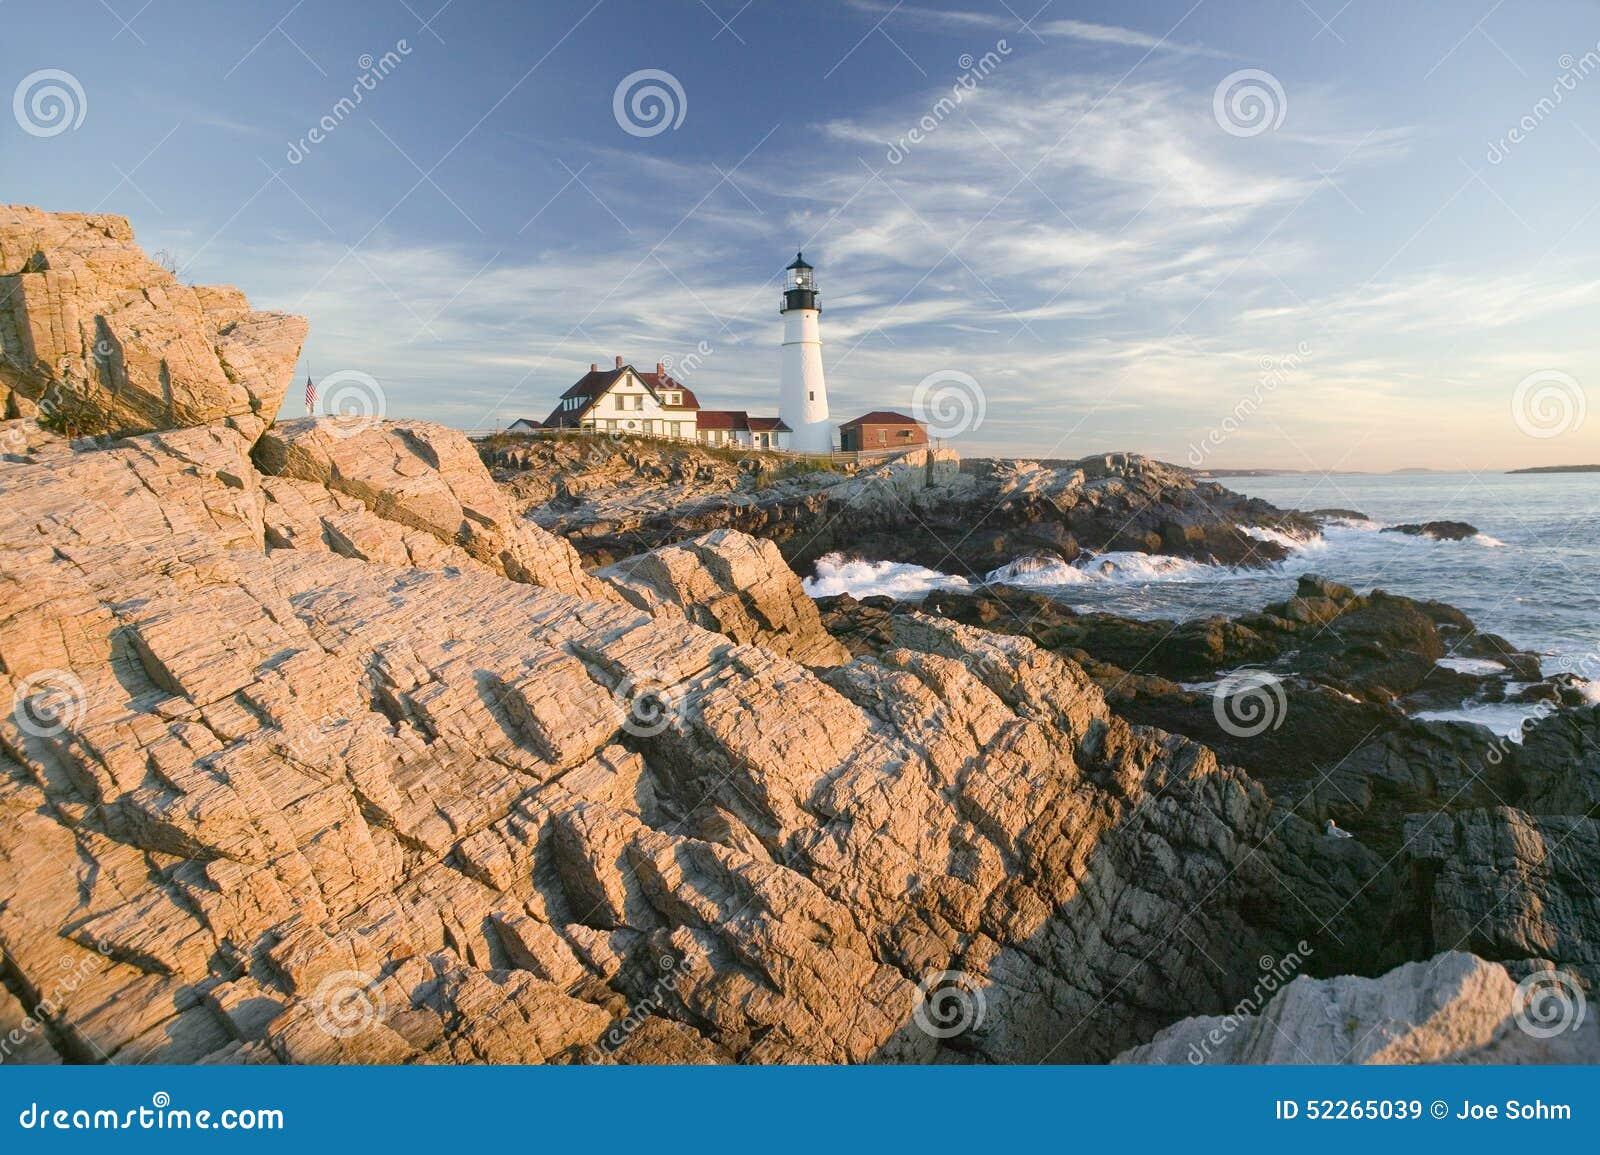 Sunrise view of Portland Head Lighthouse, Cape Elizabeth, Maine